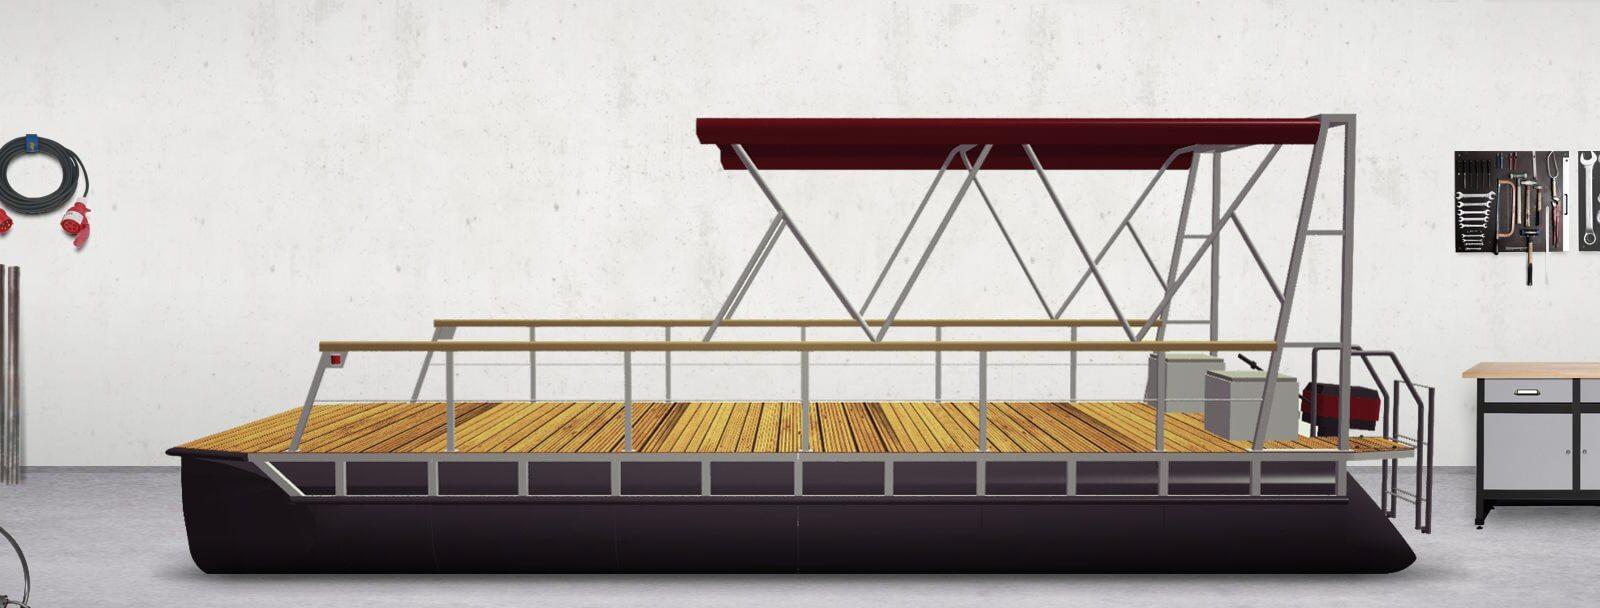 Pontonboot mit Bimini Top